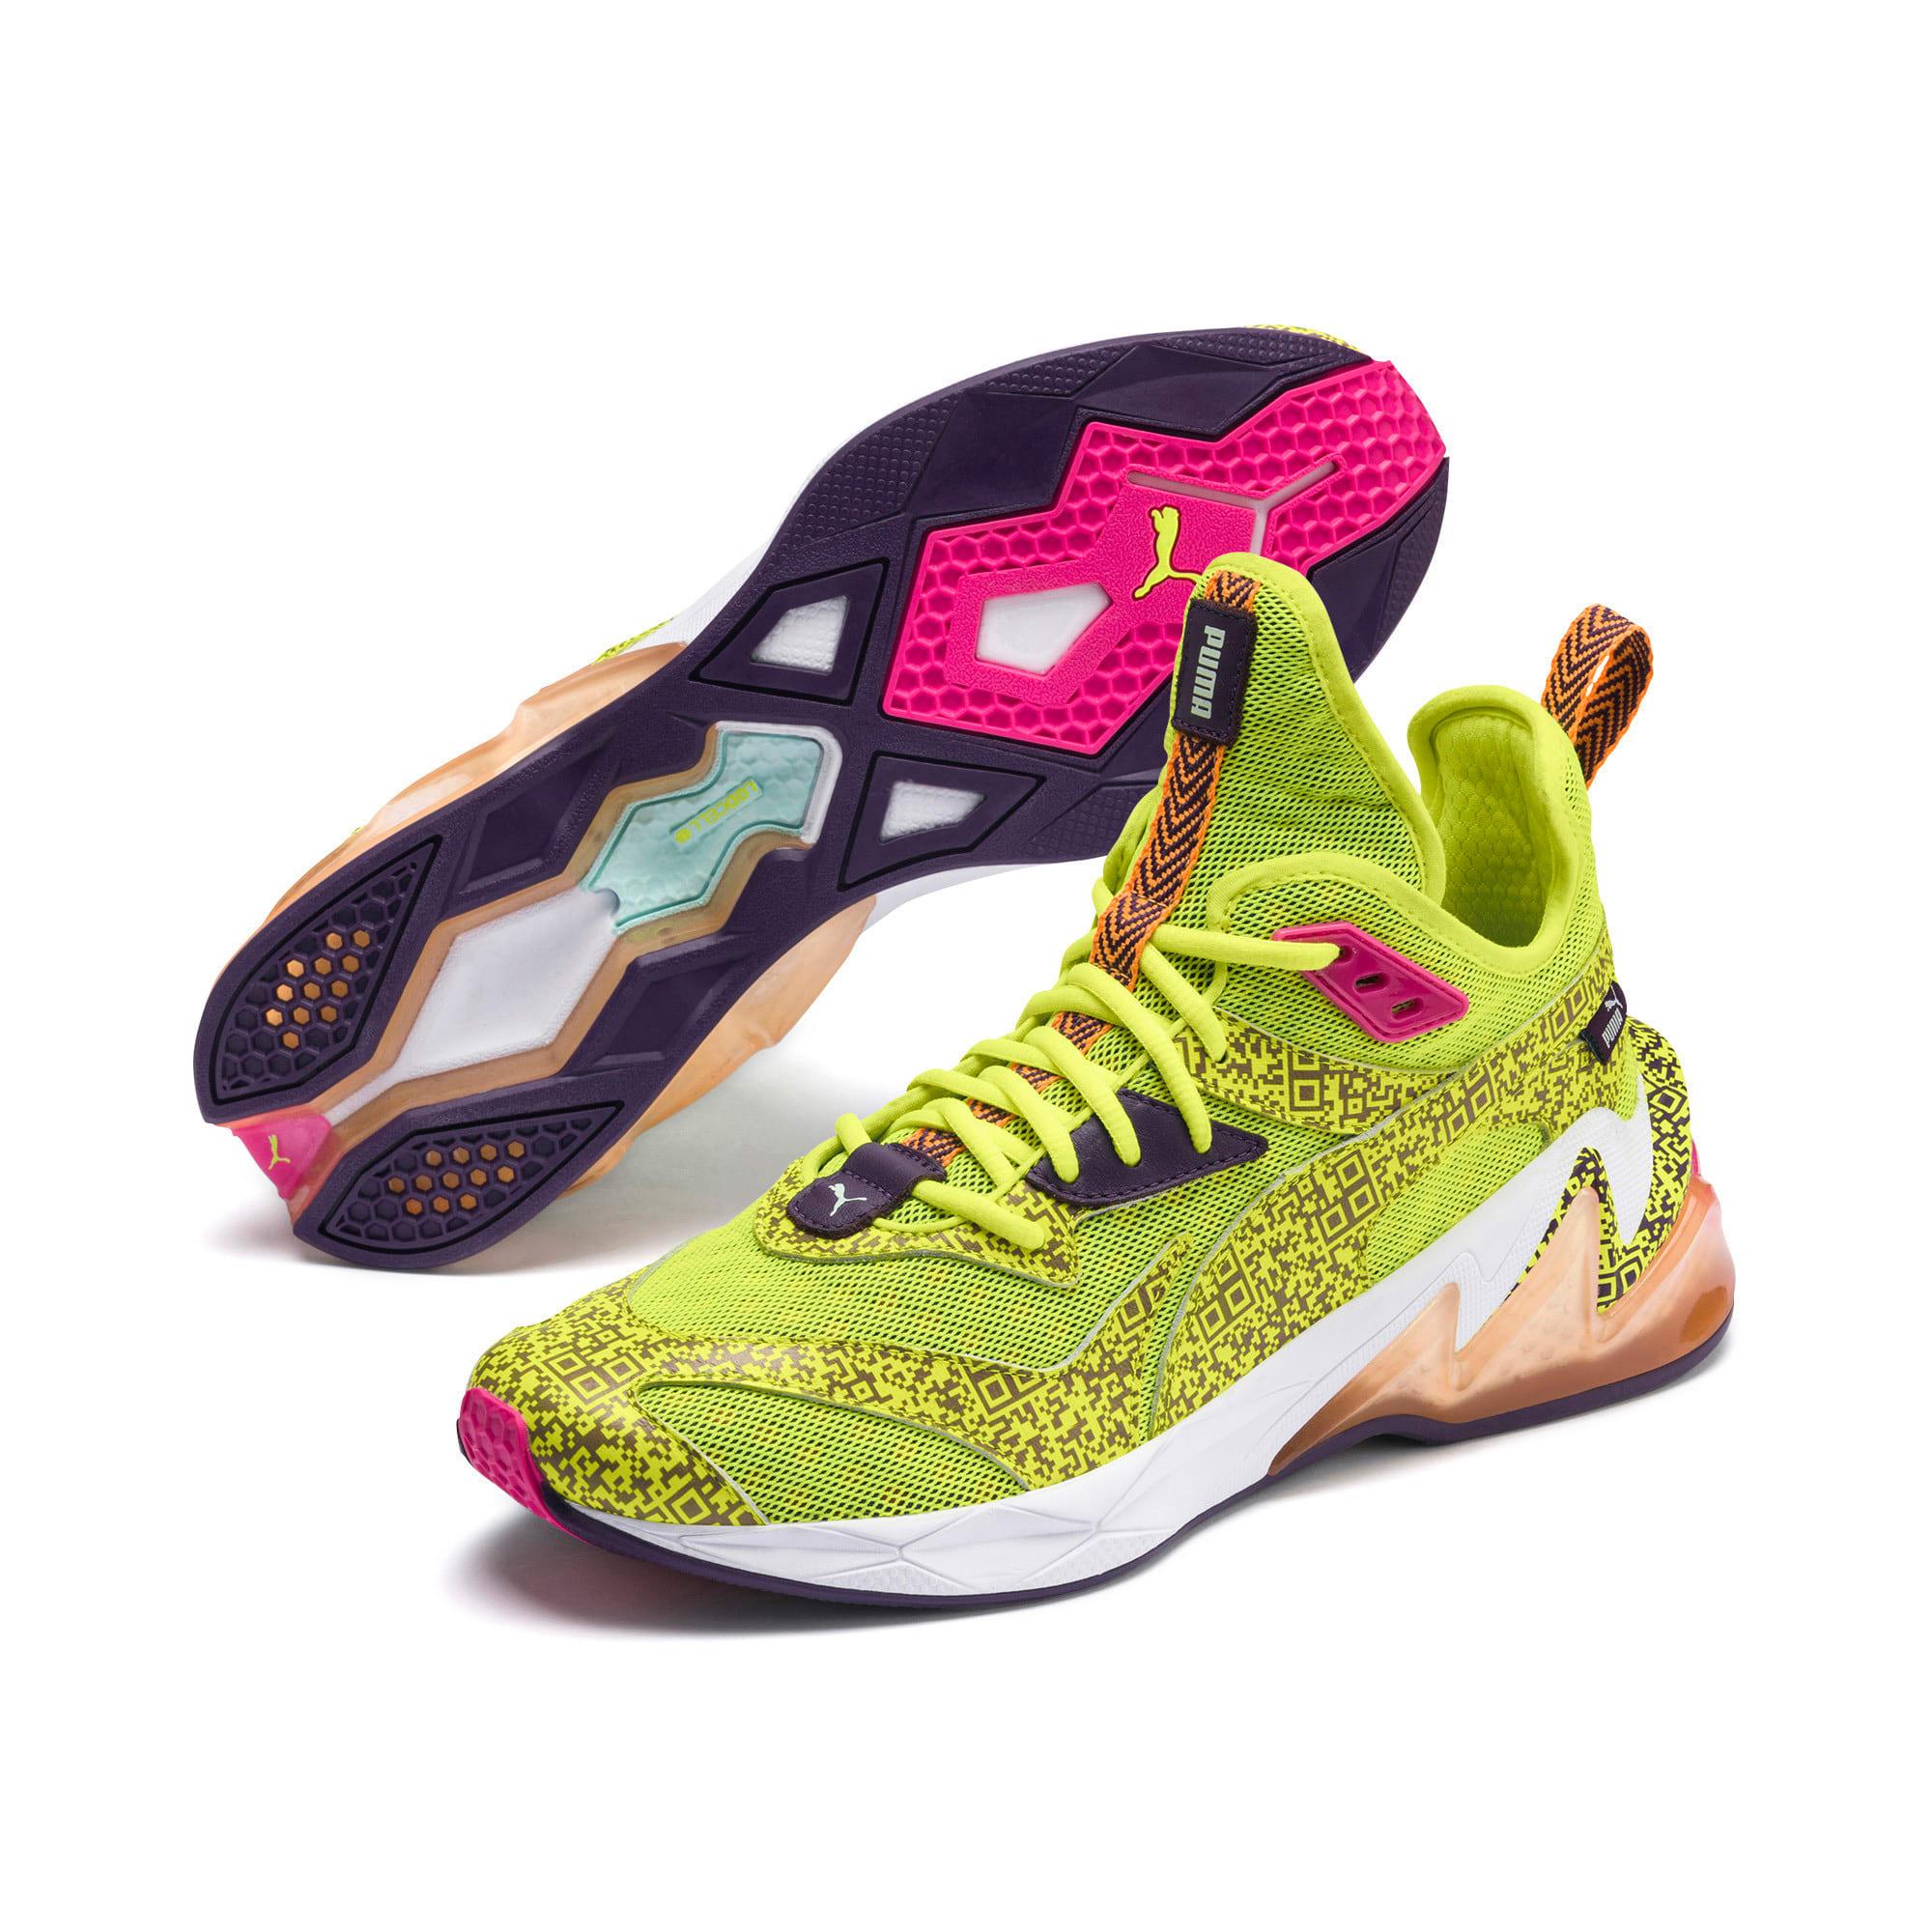 Thumbnail 2 of LQDCELL Origin AR Men's Training Shoes, Fizzy Yllow-Indigo-Ornge Pop, medium